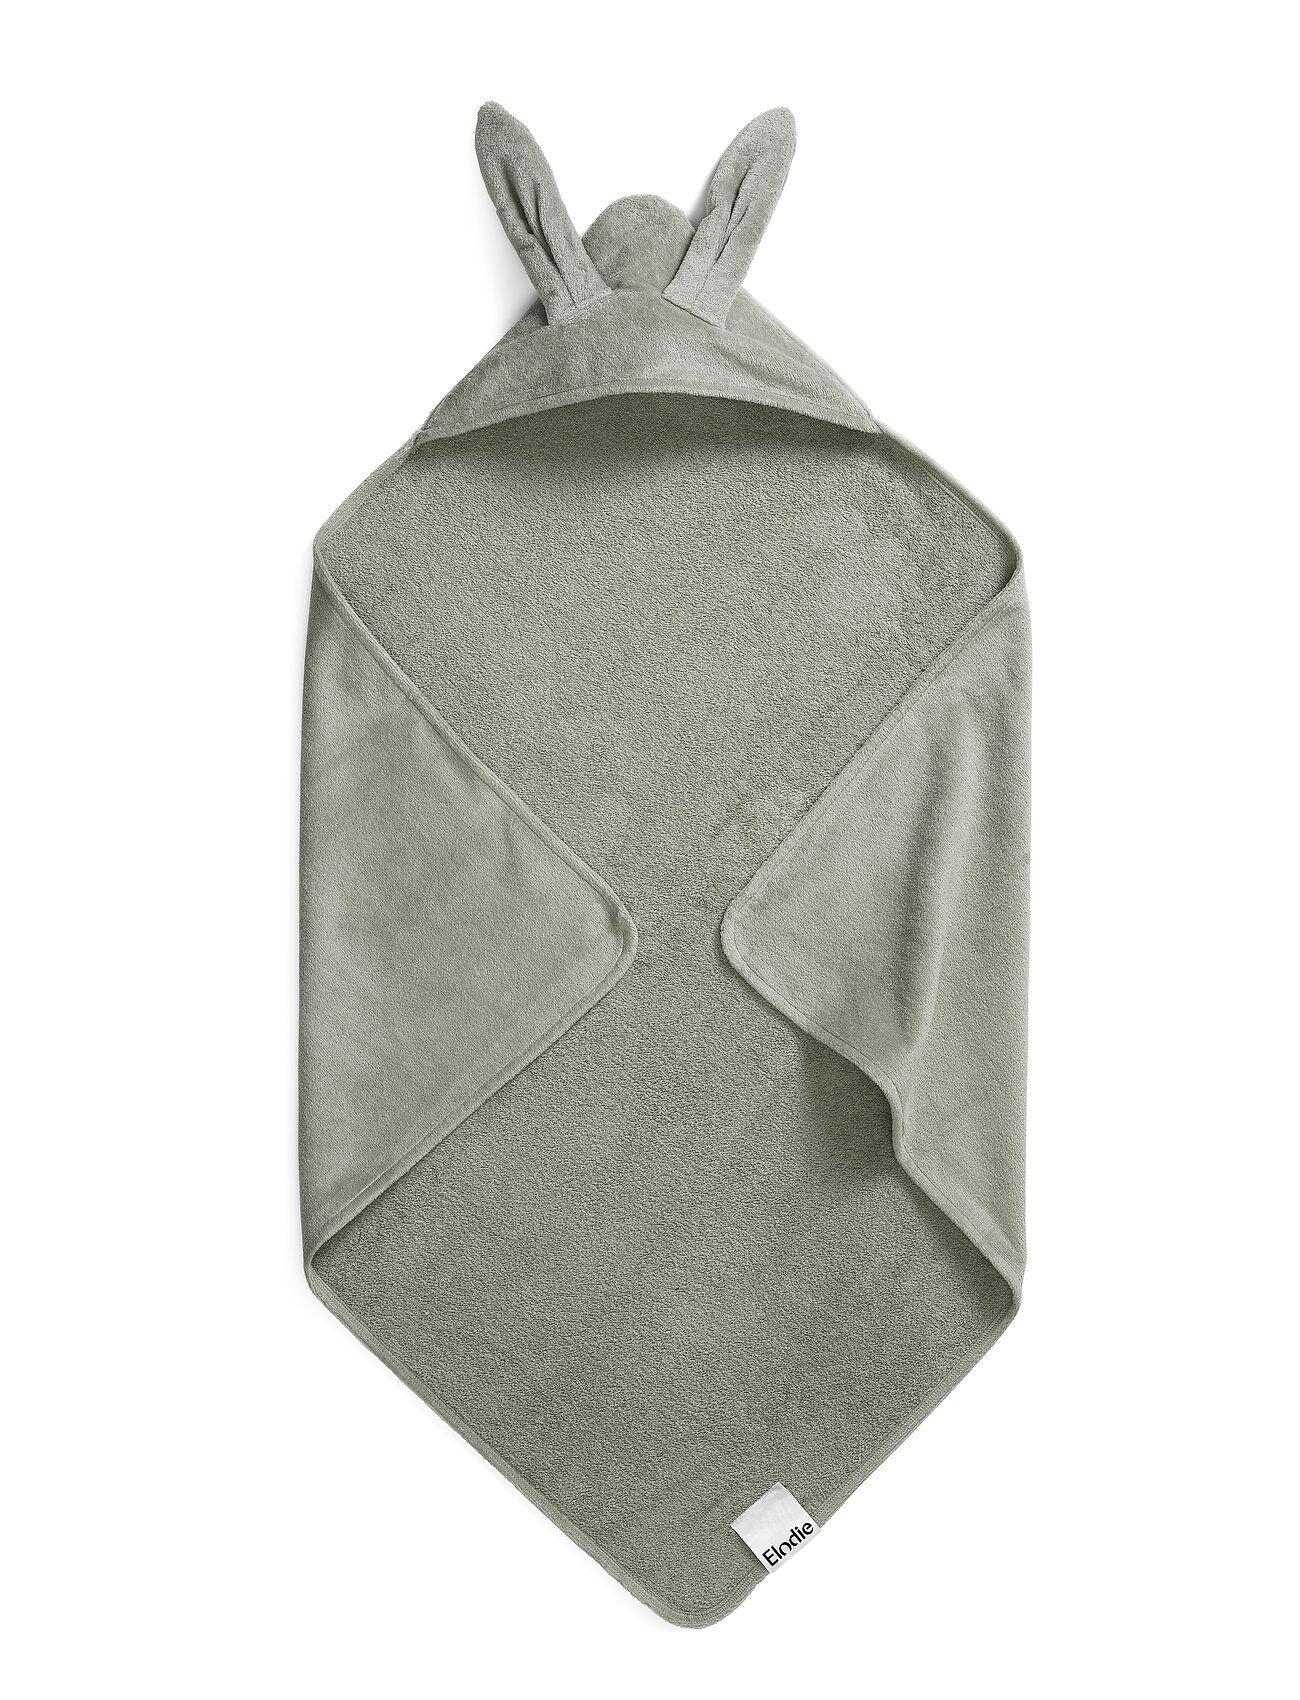 Elodie Details Hooded Towel - Mineral Green Bunny Home Bath Time Vihreä Elodie Details